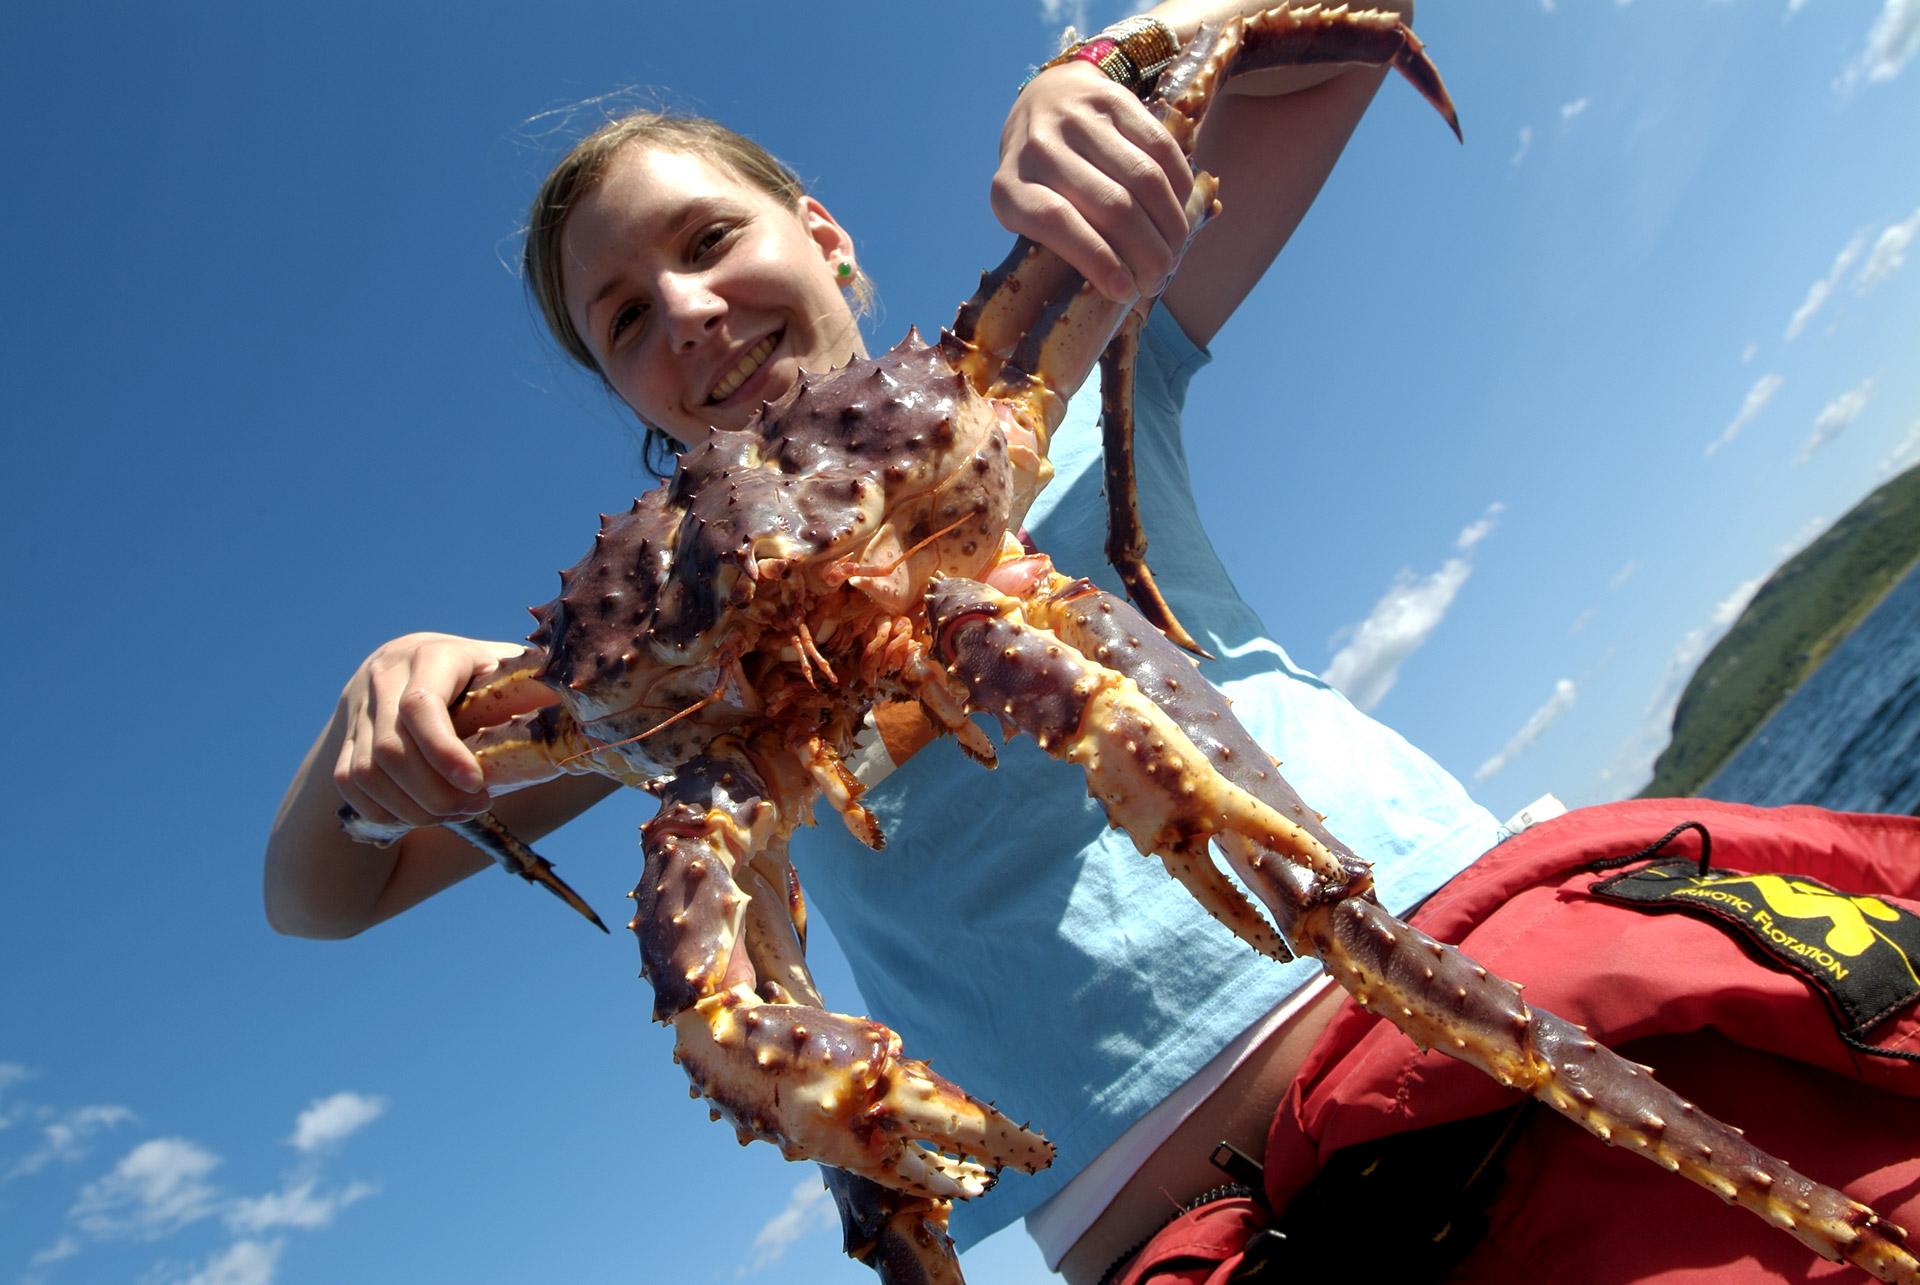 King Crab © Trym Ivar Bergsmo